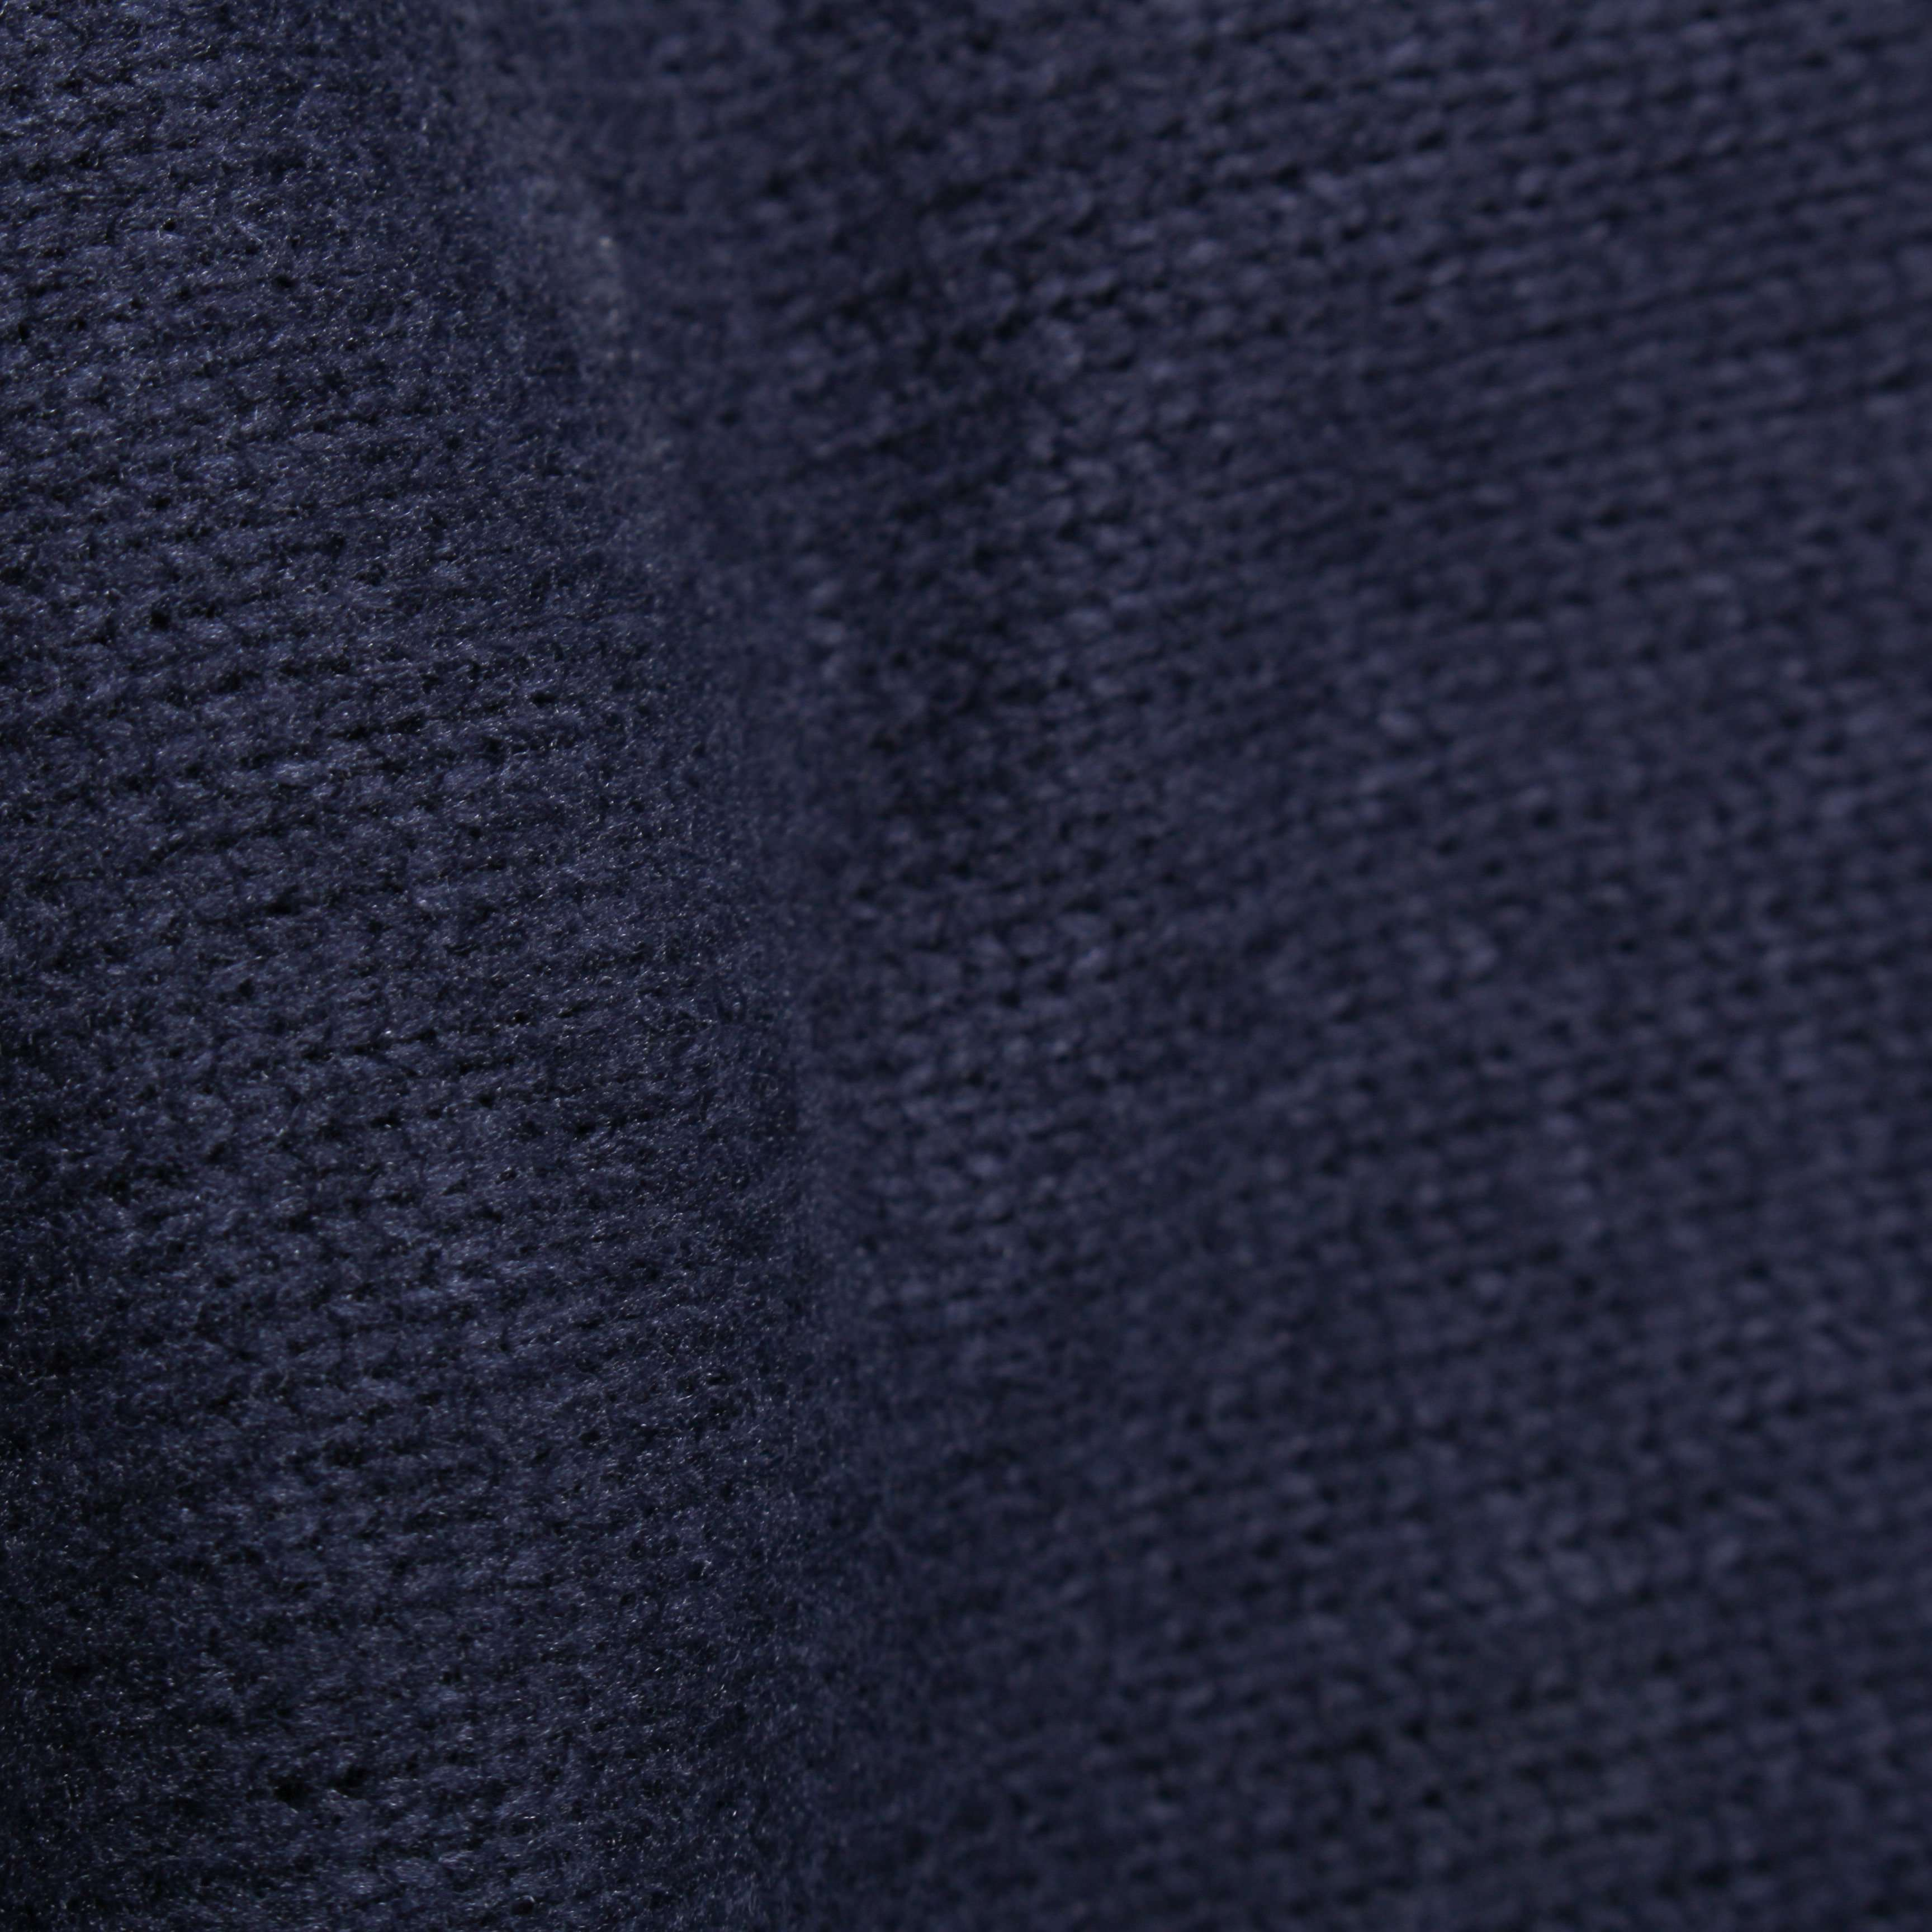 Patagonia Better Sweater Marsupial Pullover Fleece